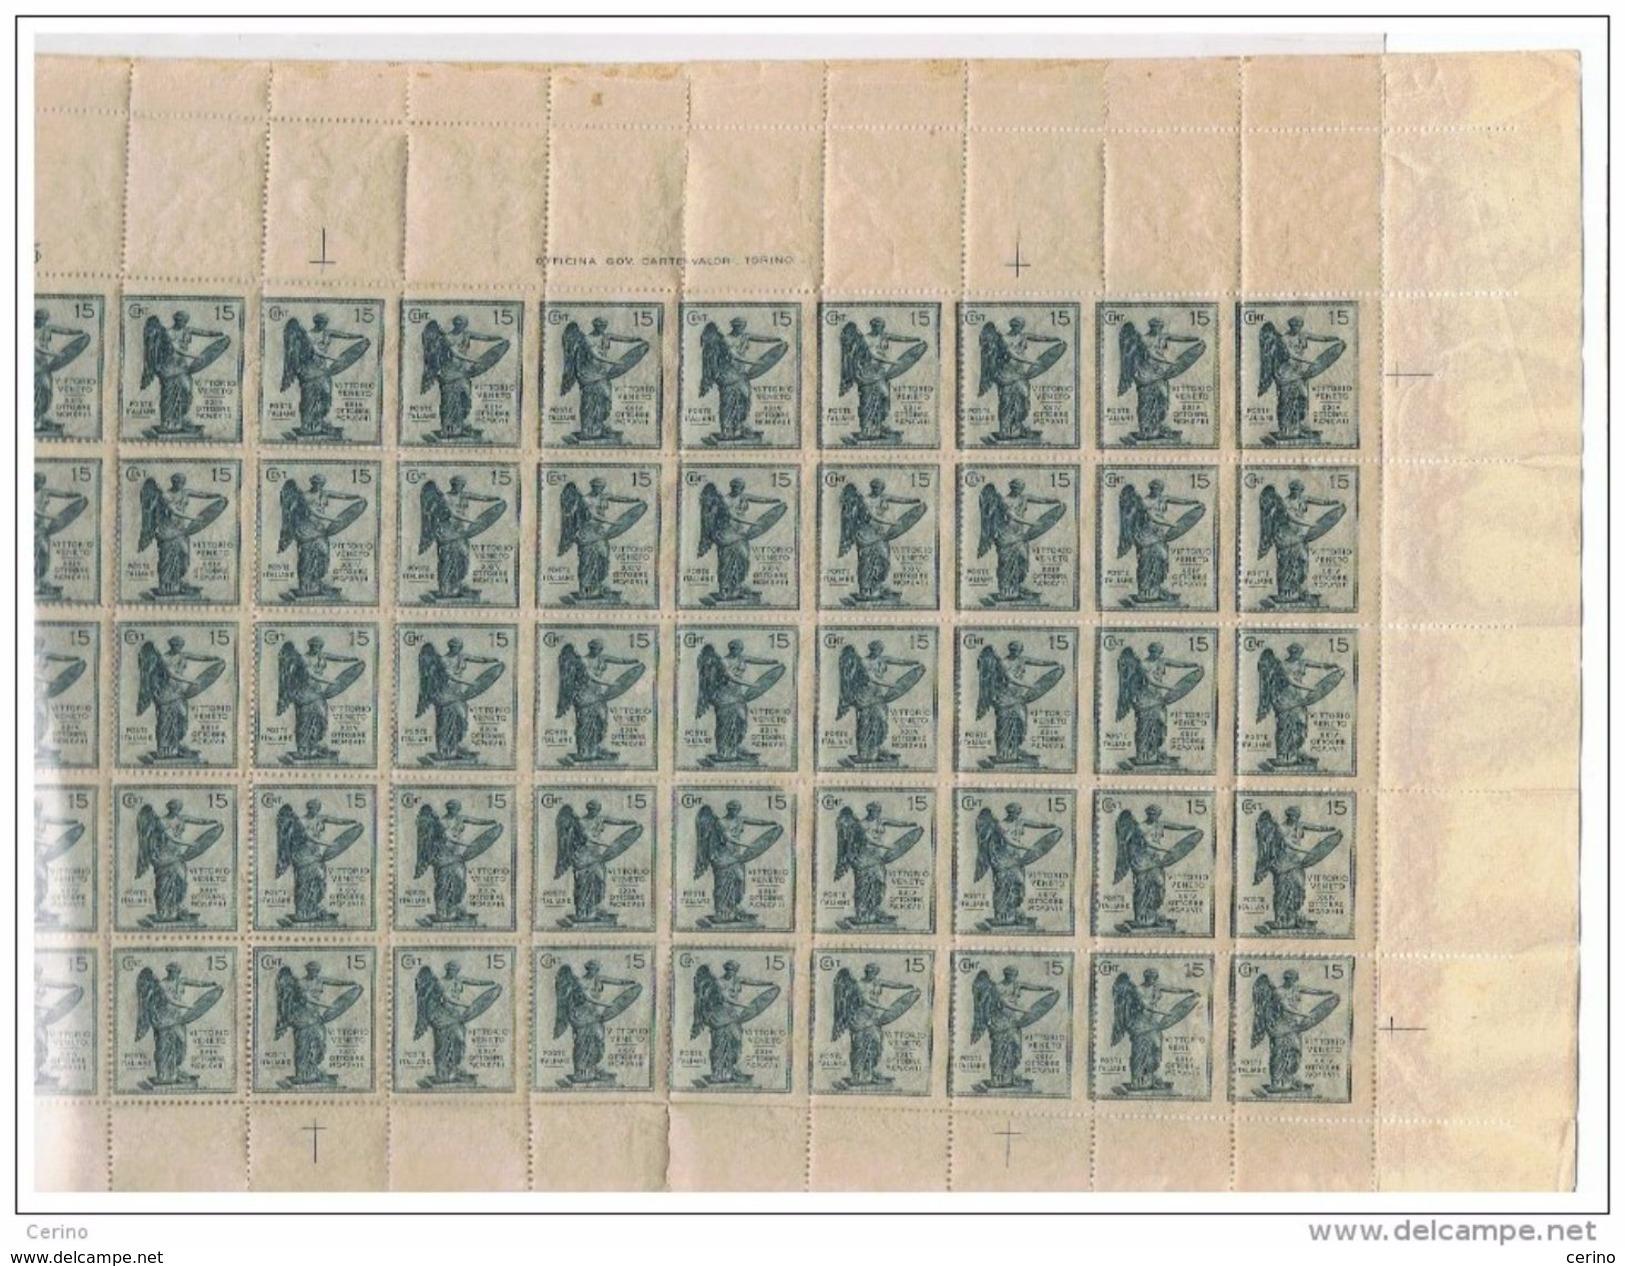 REGNO: 1921  VITTORIA  ALATA  -  S. CPL. 4 VAL. FGL. 50  N. -  SASS. 119b + 120a + 121b + 122b  -  INSIEME  FORSE  UNICO - Nuovi